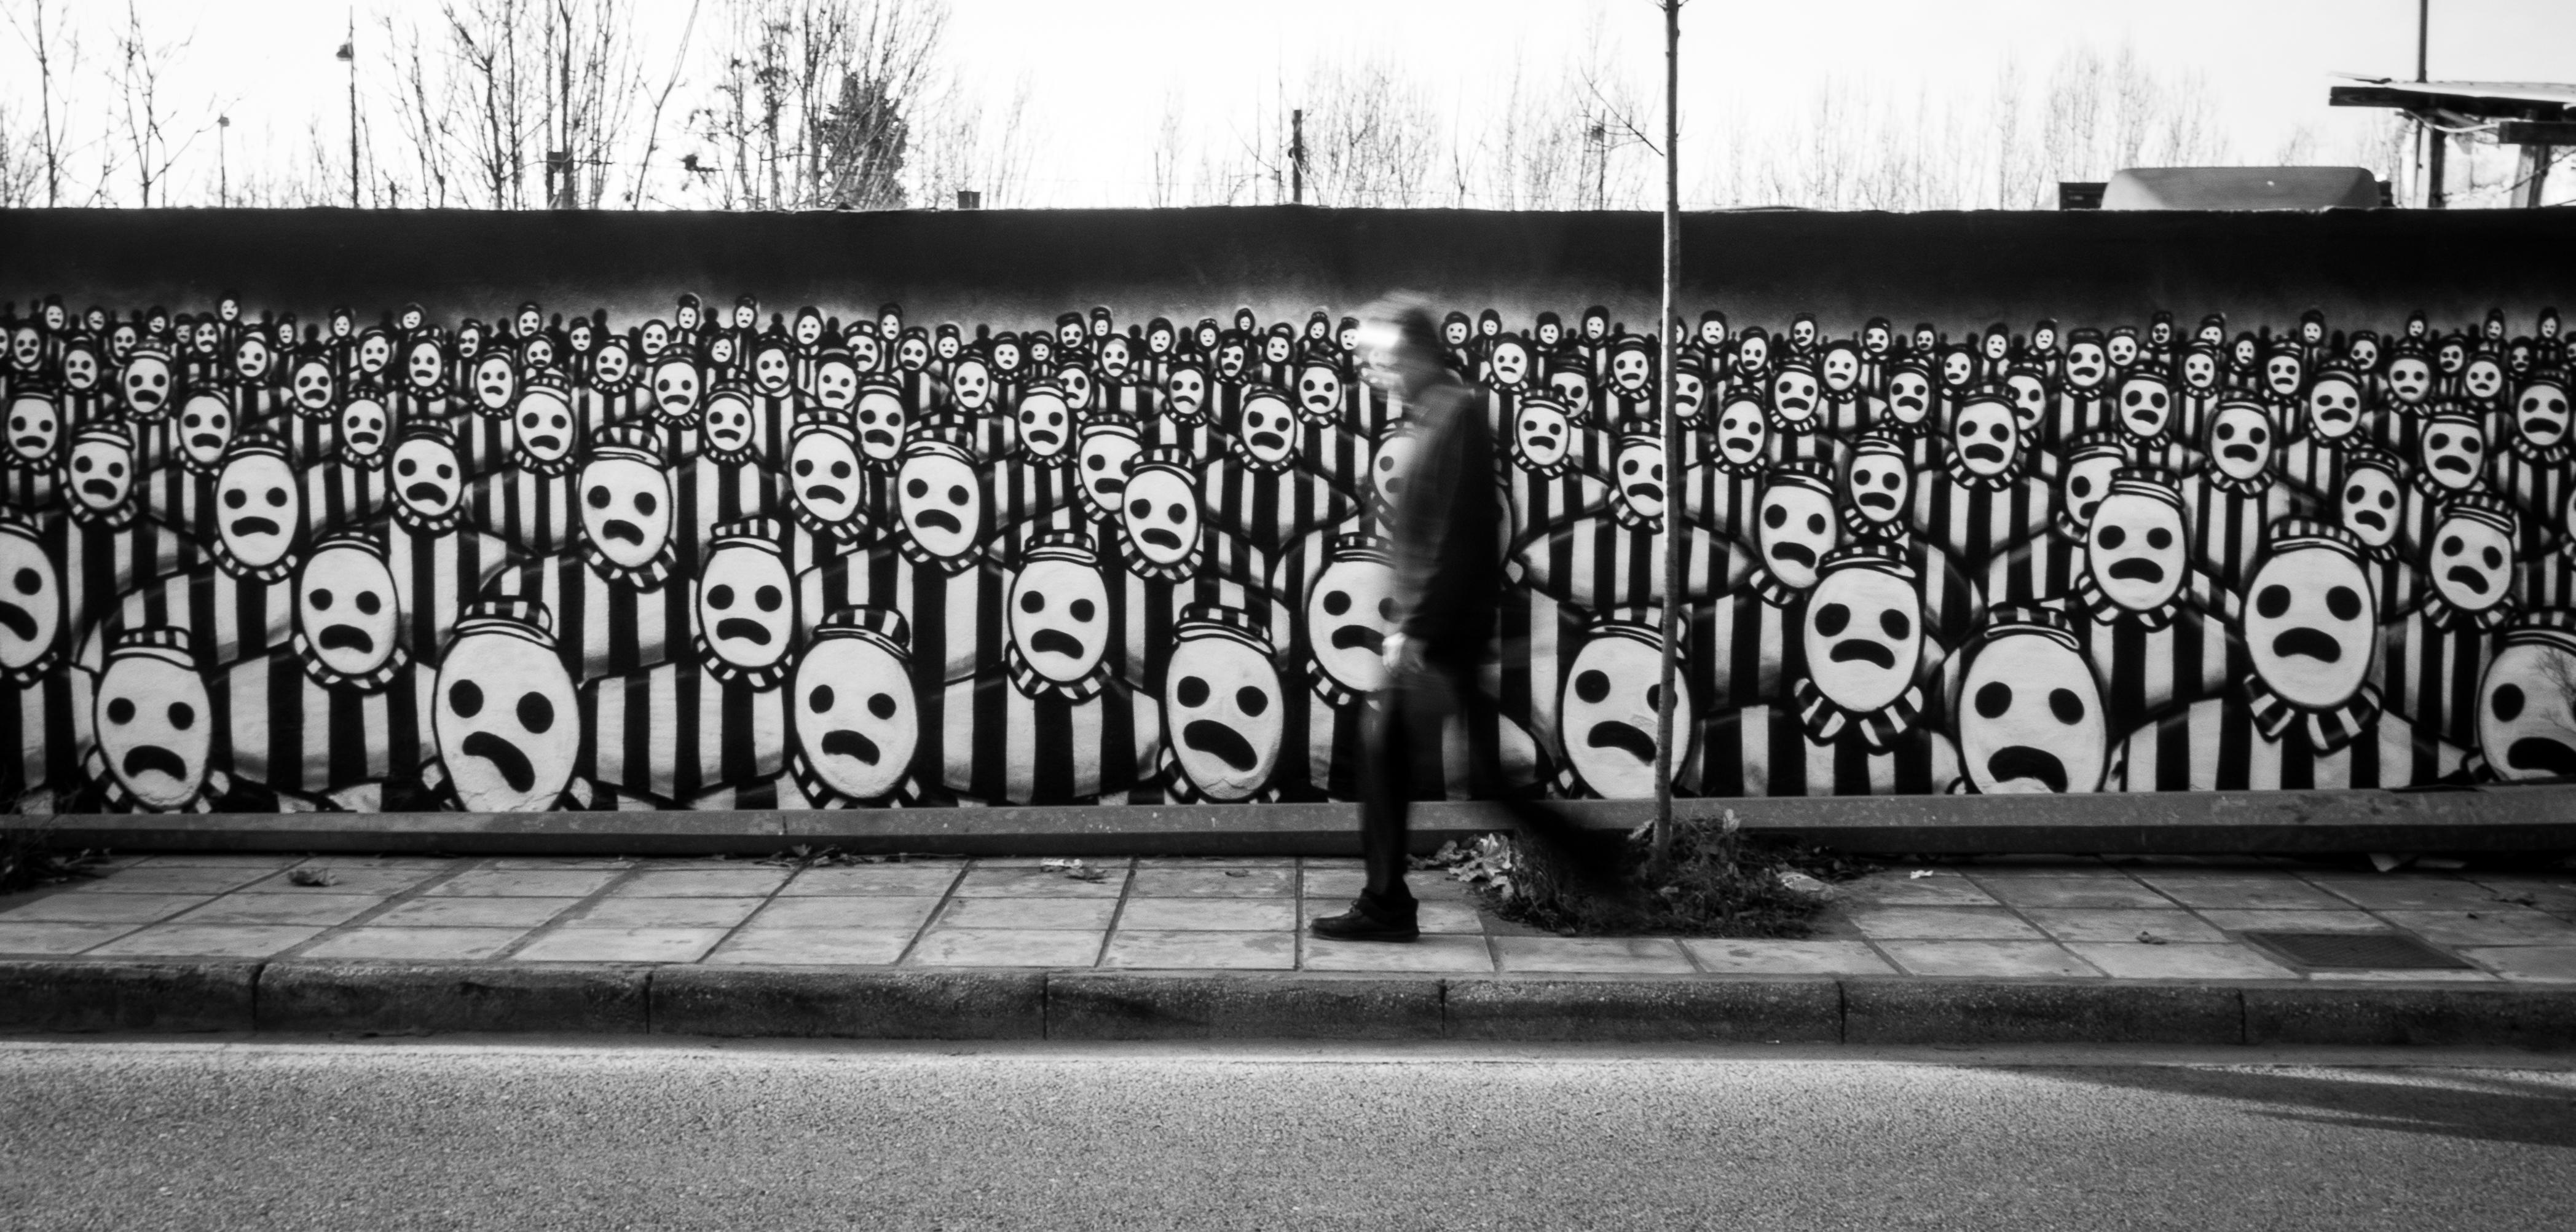 Graffiti wall black - Black And White Road White Street Wall Black Monochrome Graffiti Art Shape Urban Area Monochrome Photography